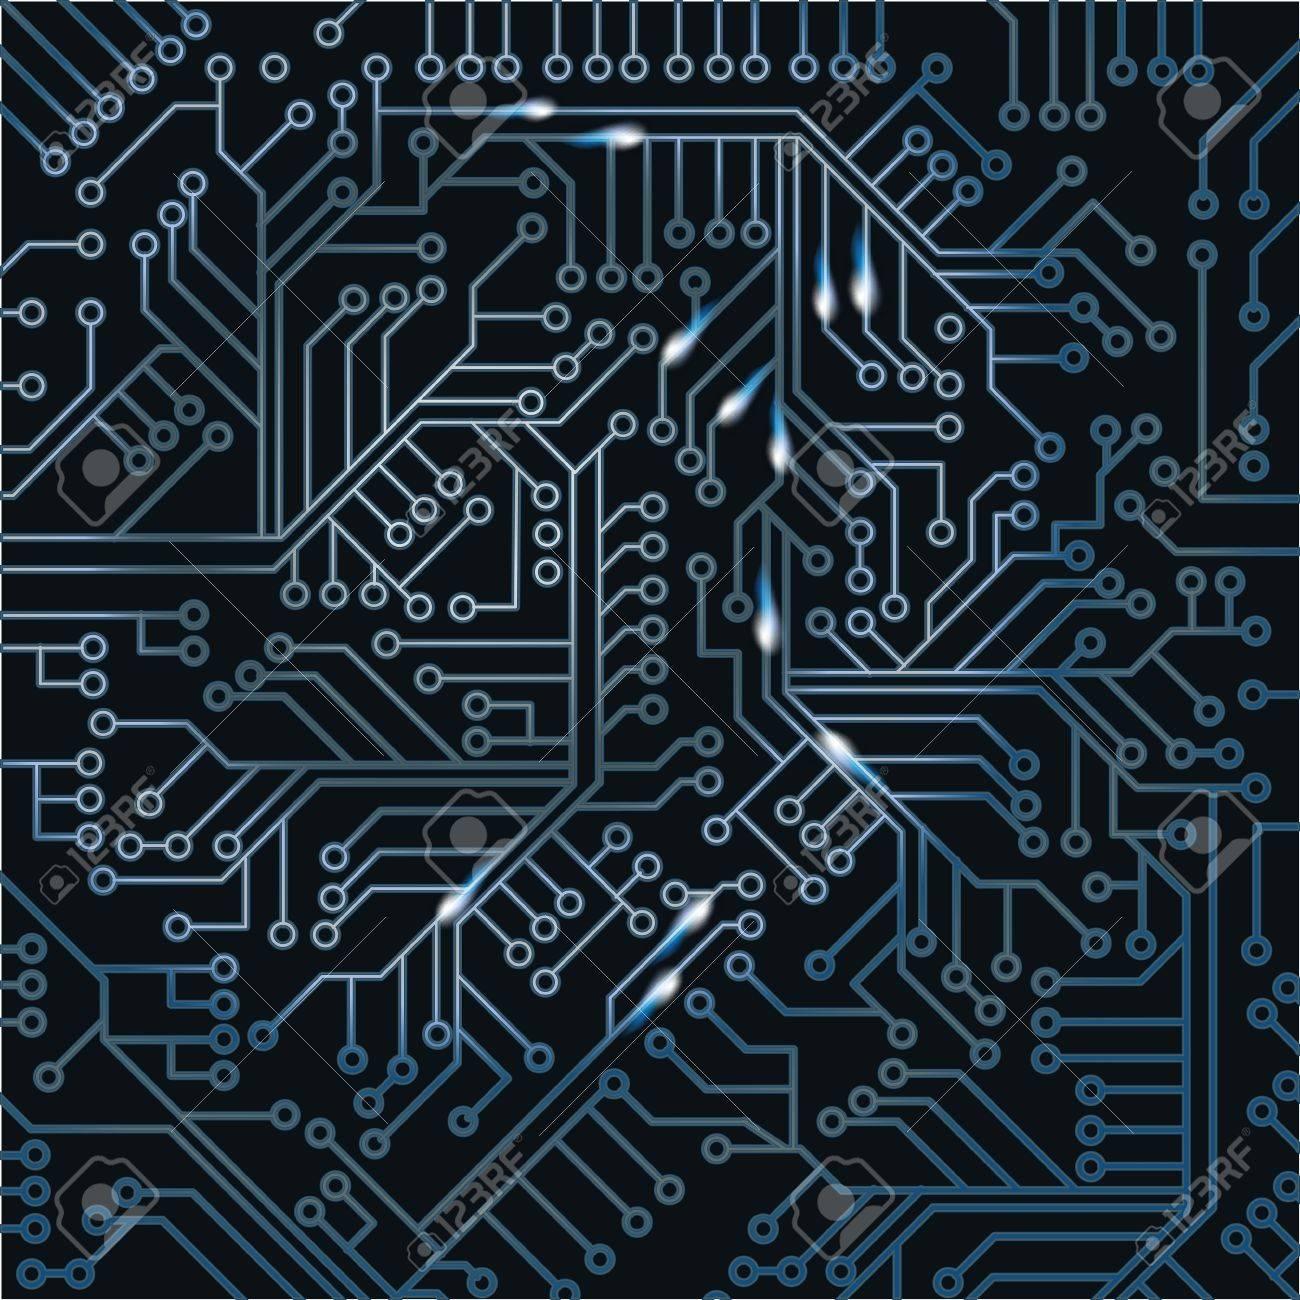 Dark computer board with wiring Stock Vector - 20458069